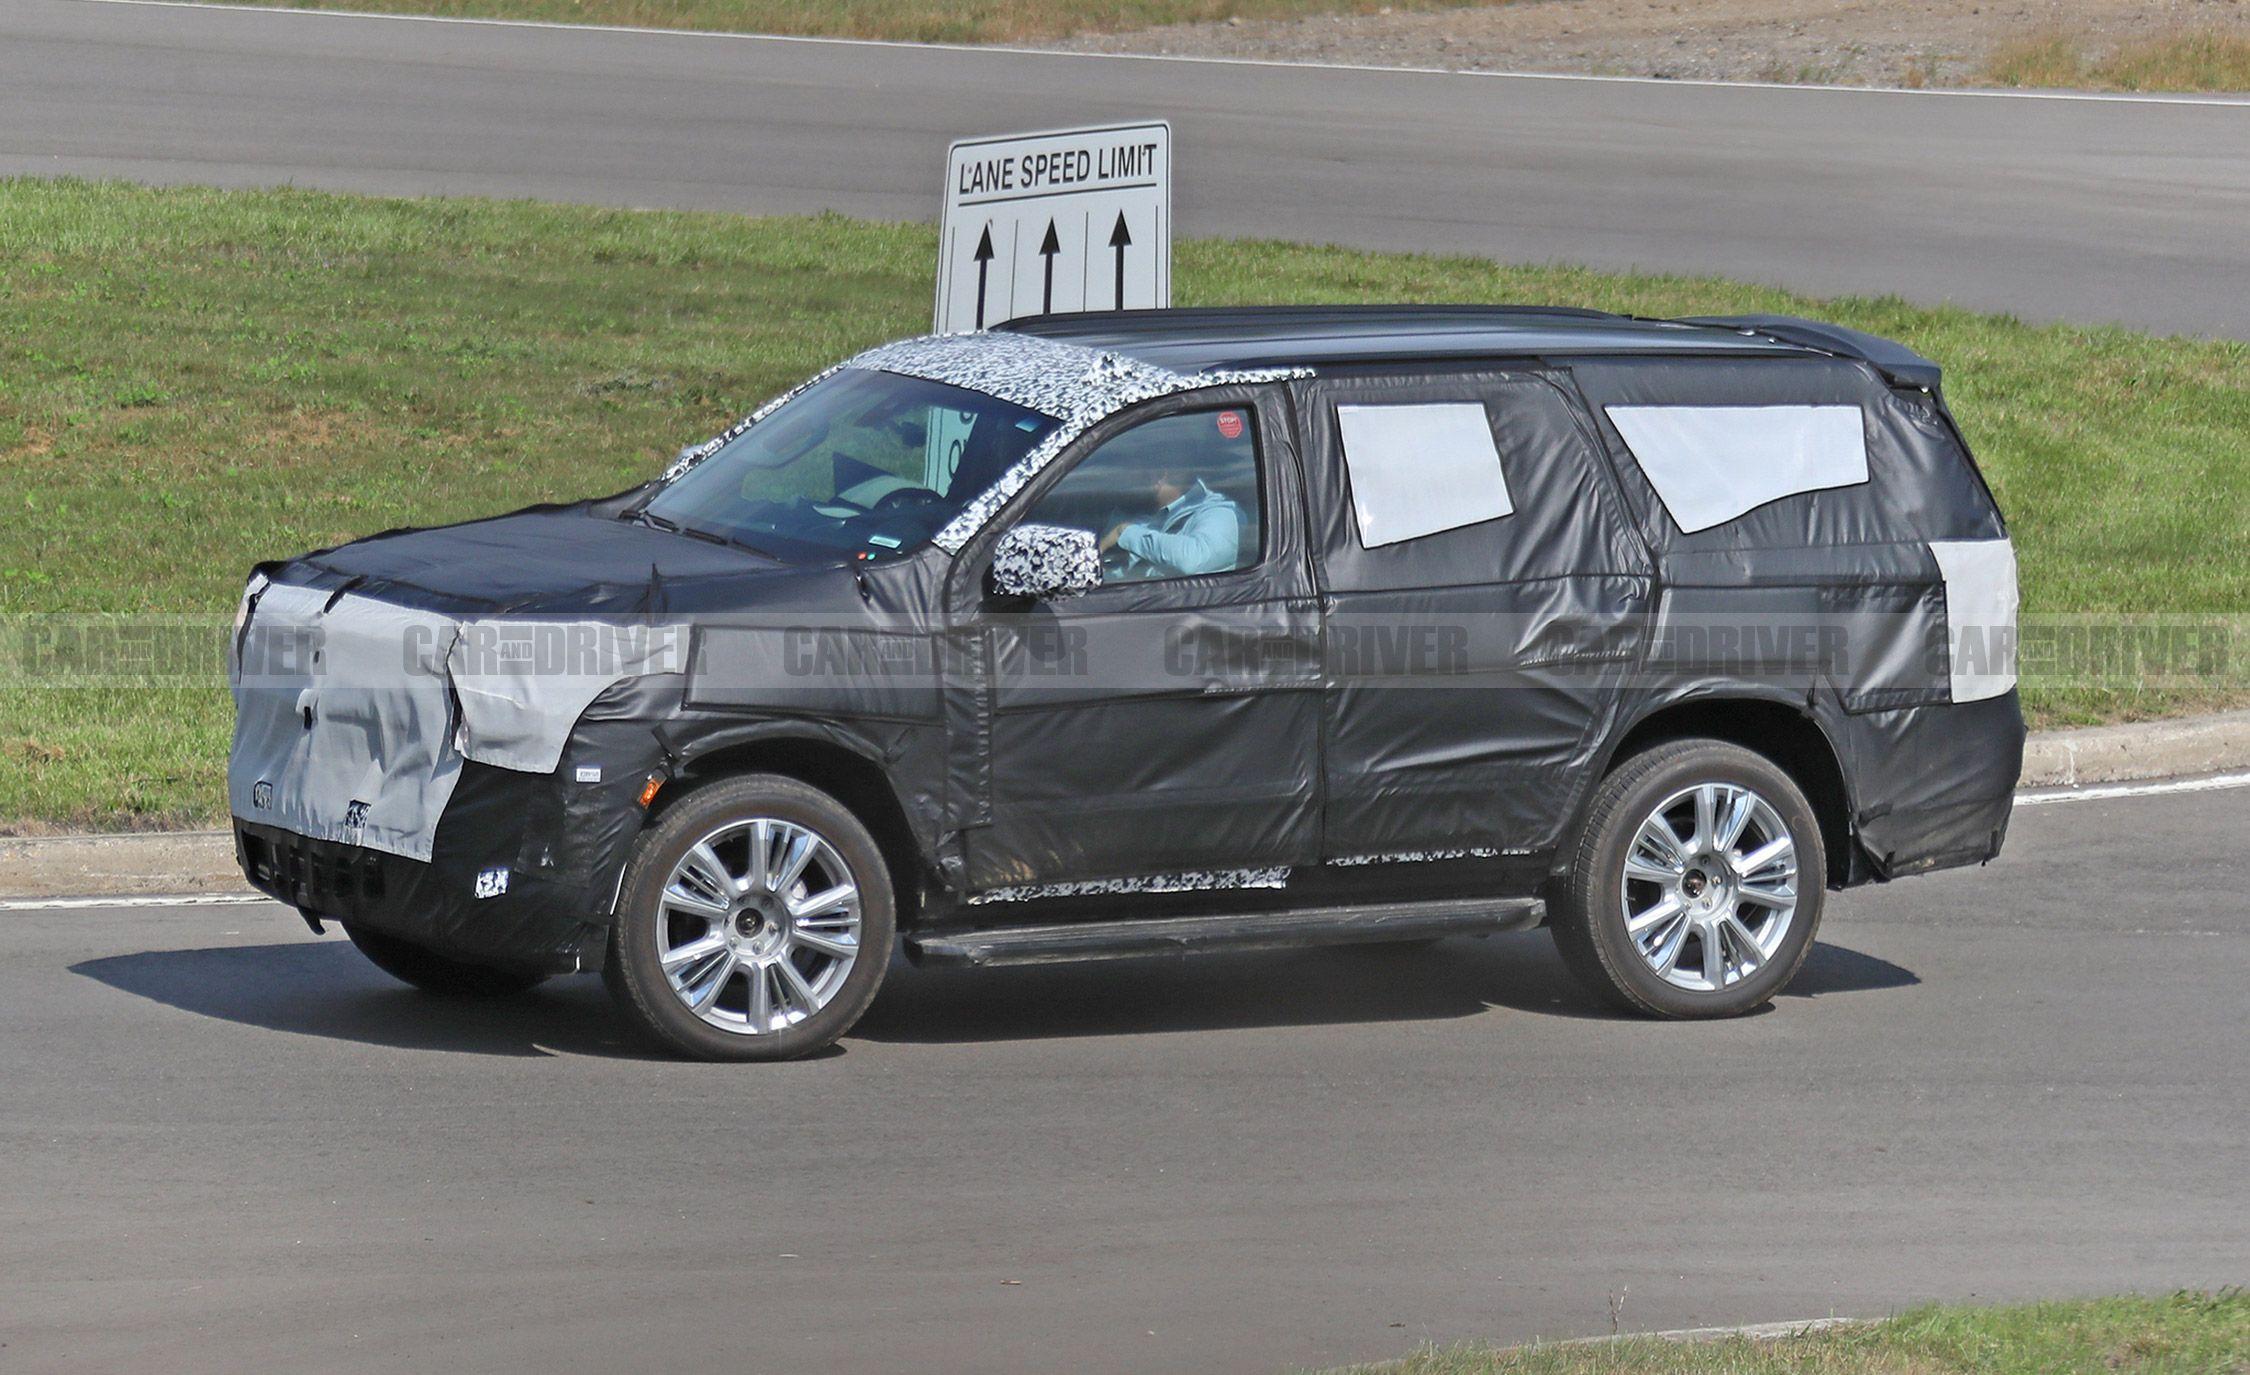 2020 Chevrolet Tahoe Spy Photos Next Gen Full Size Suv